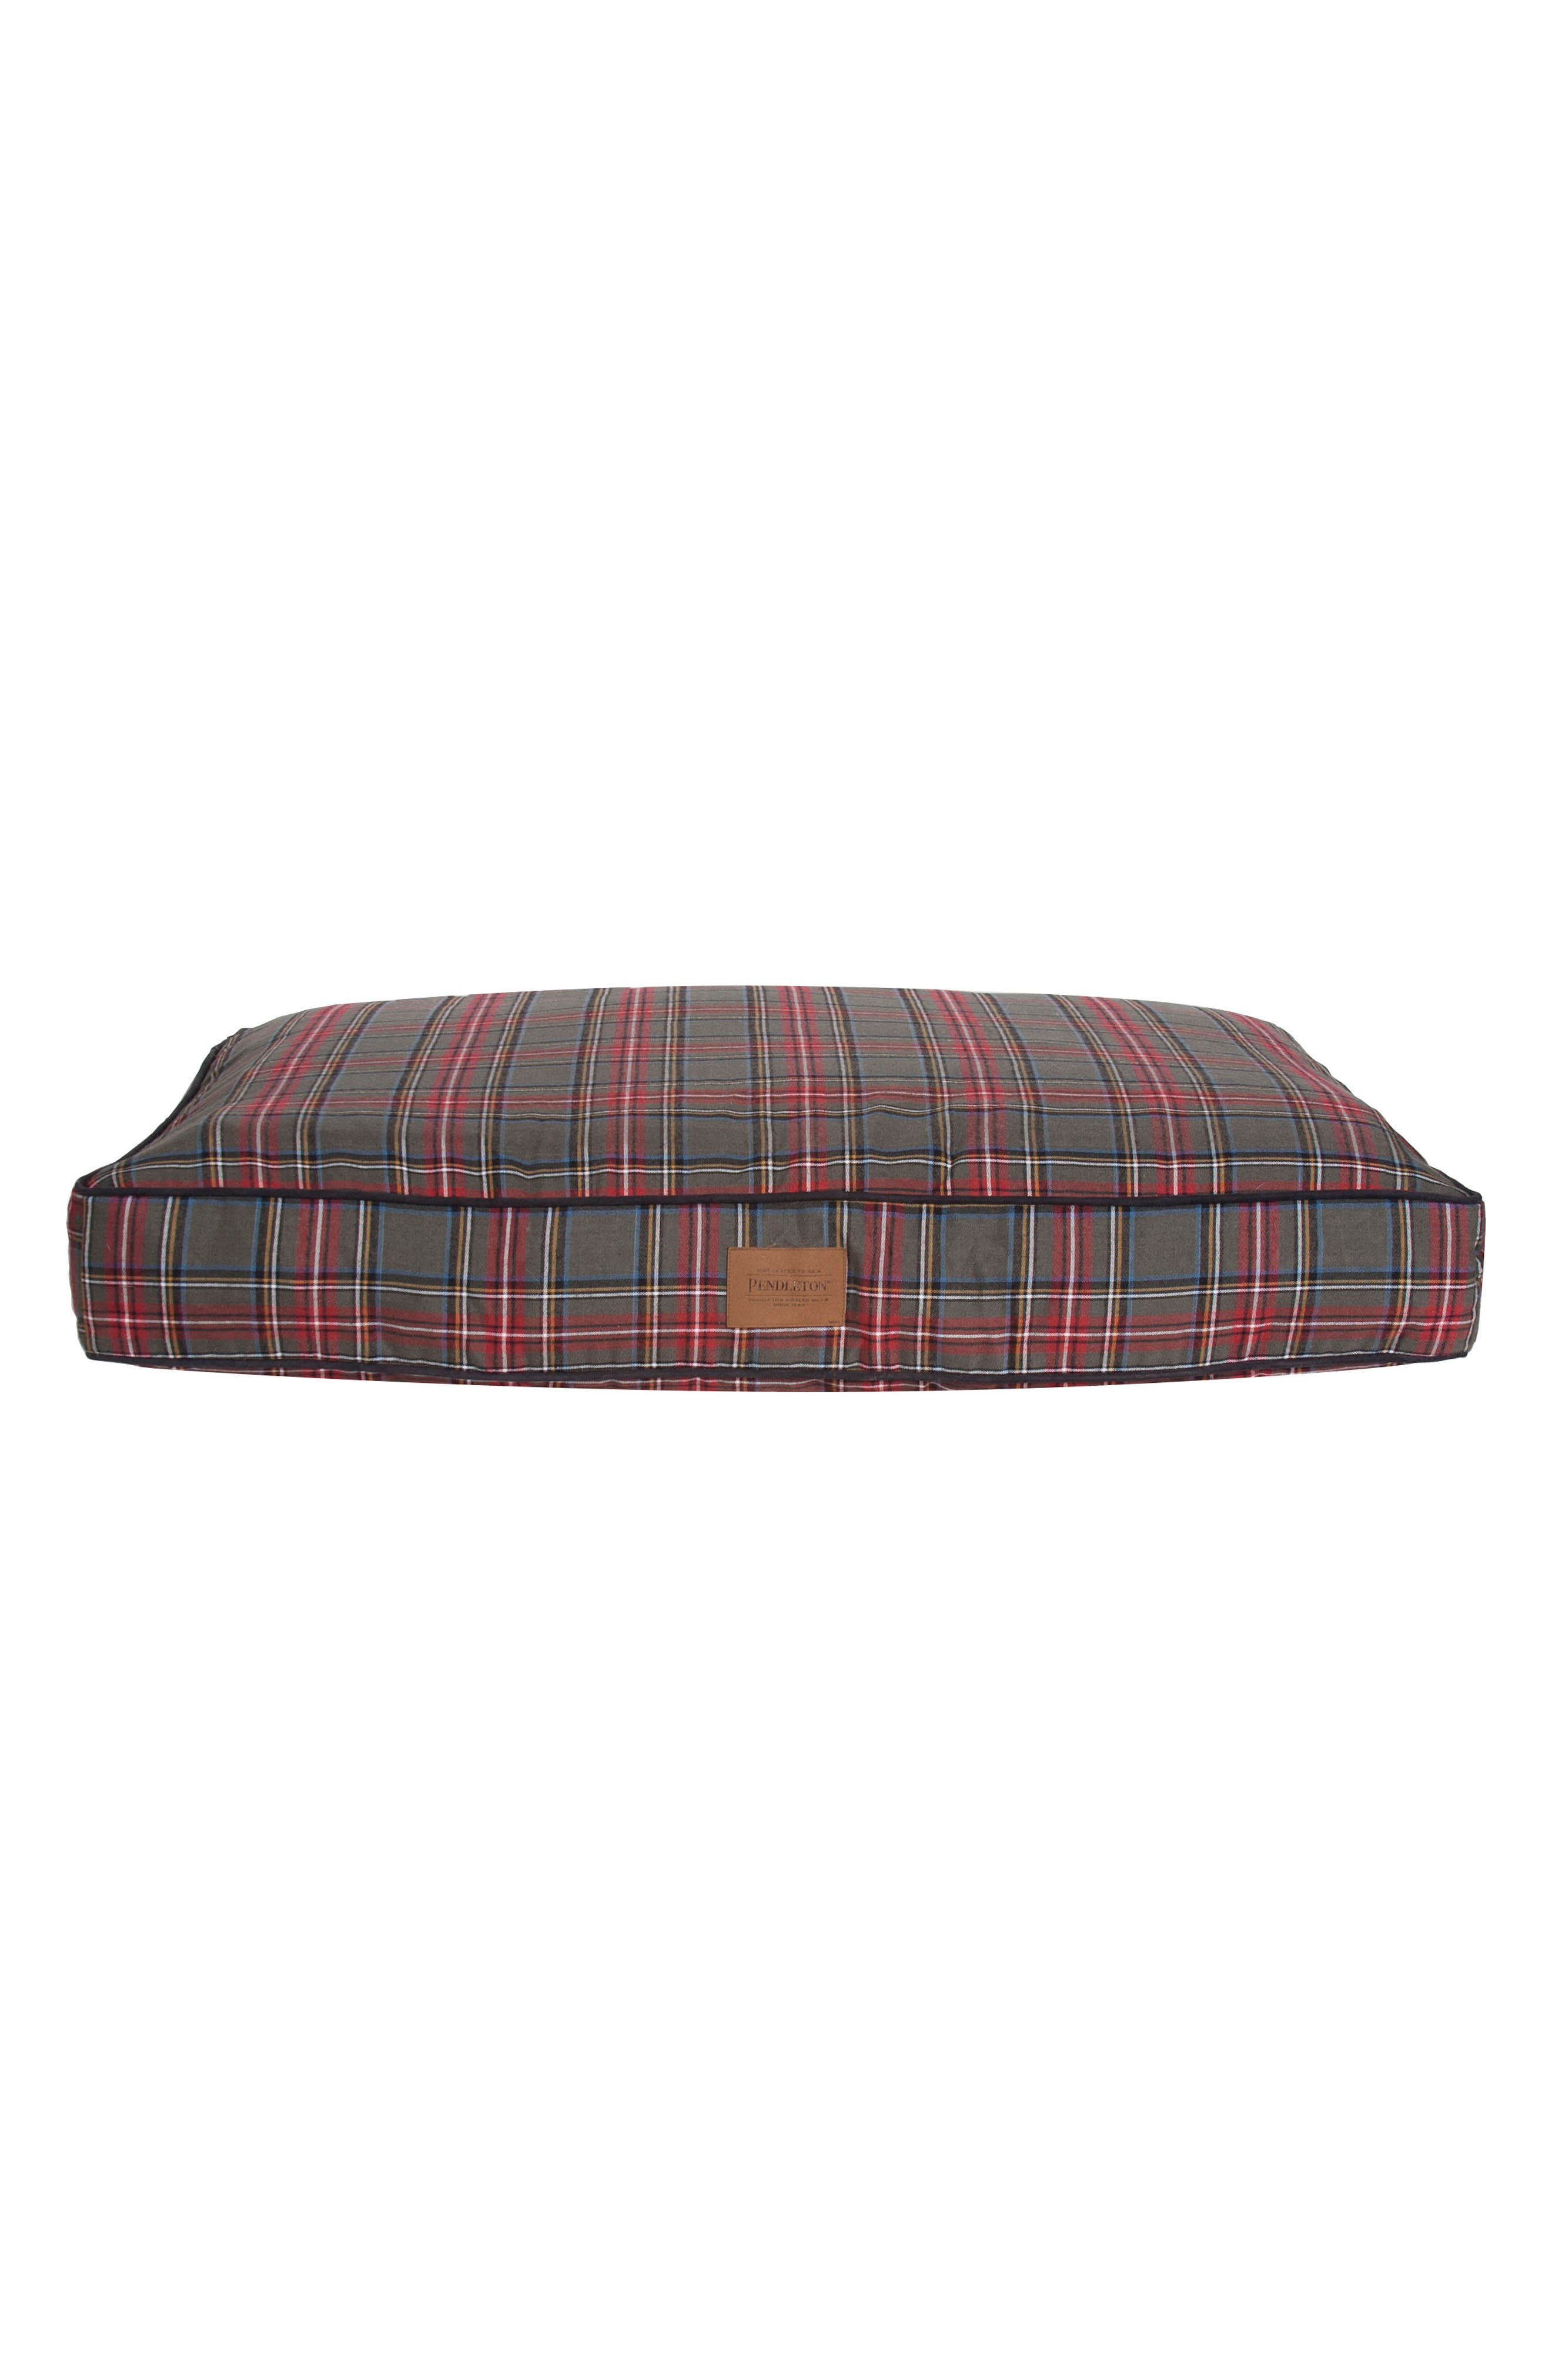 x Pendleton Classics Tartan Pet Bed,                             Main thumbnail 1, color,                             GREY STEWART